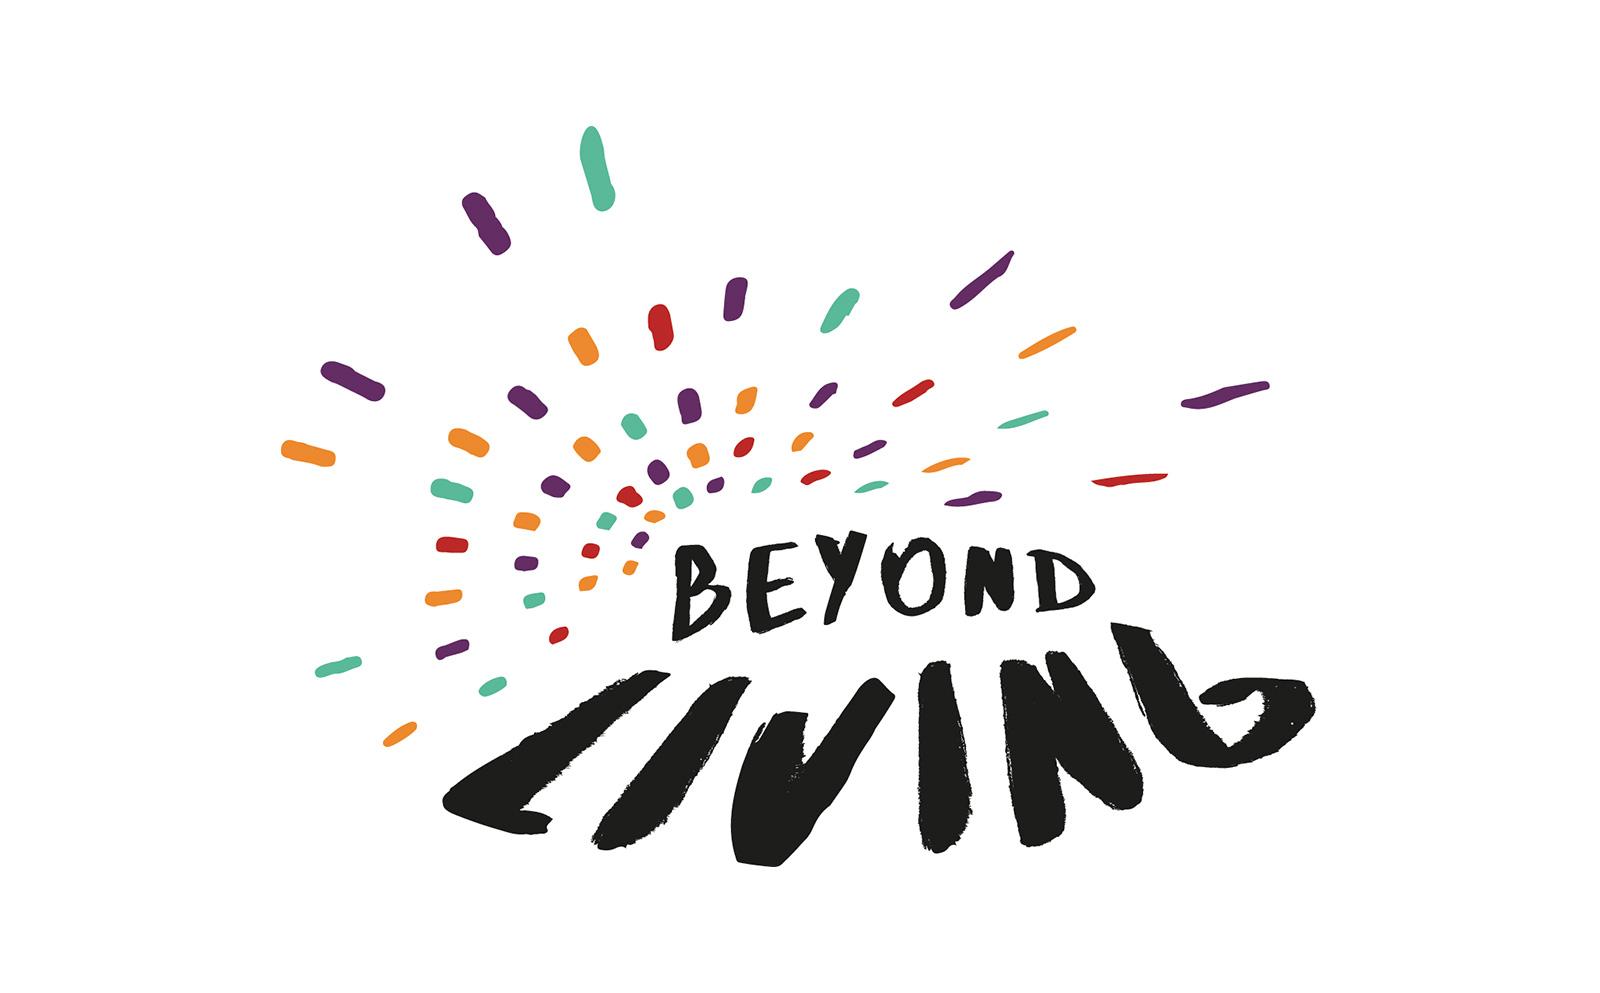 Beyond living logo